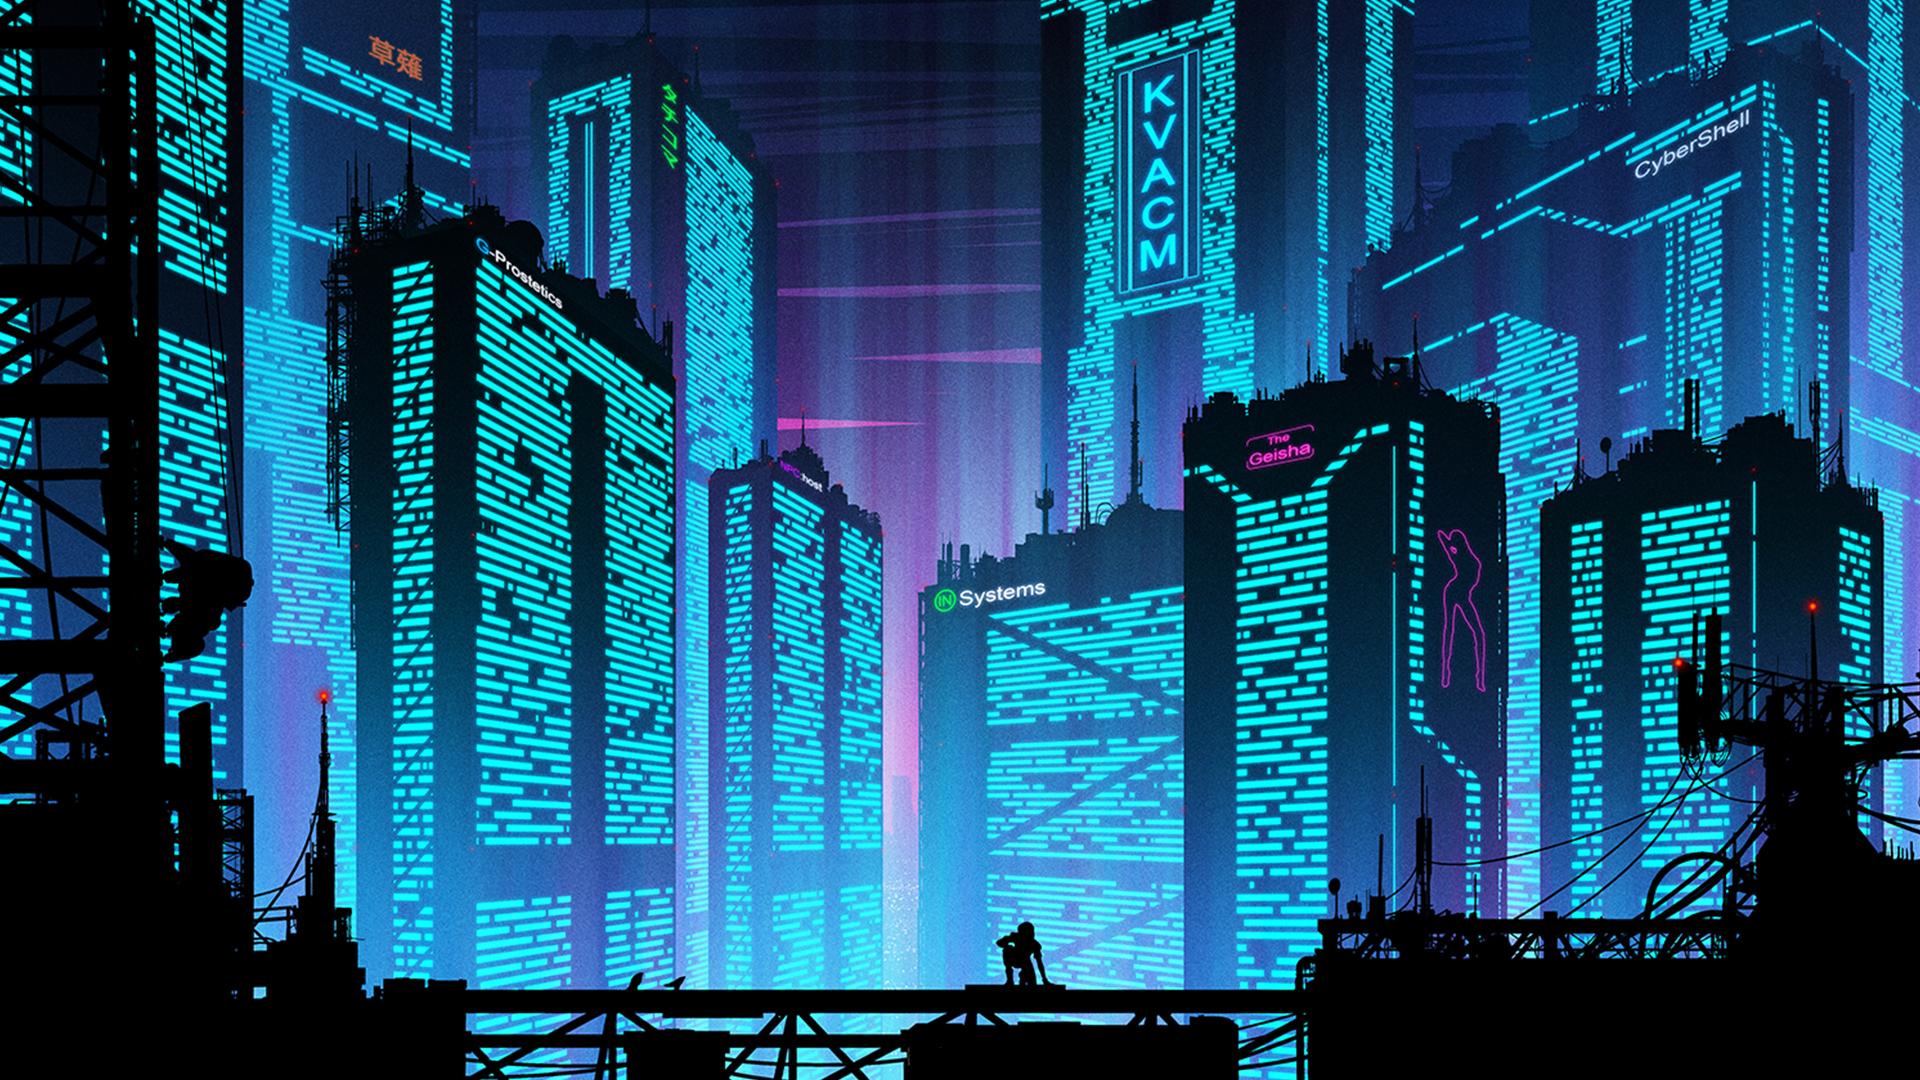 Cyberpunk Futuristic New Port City Wallpaper Hd City 4k